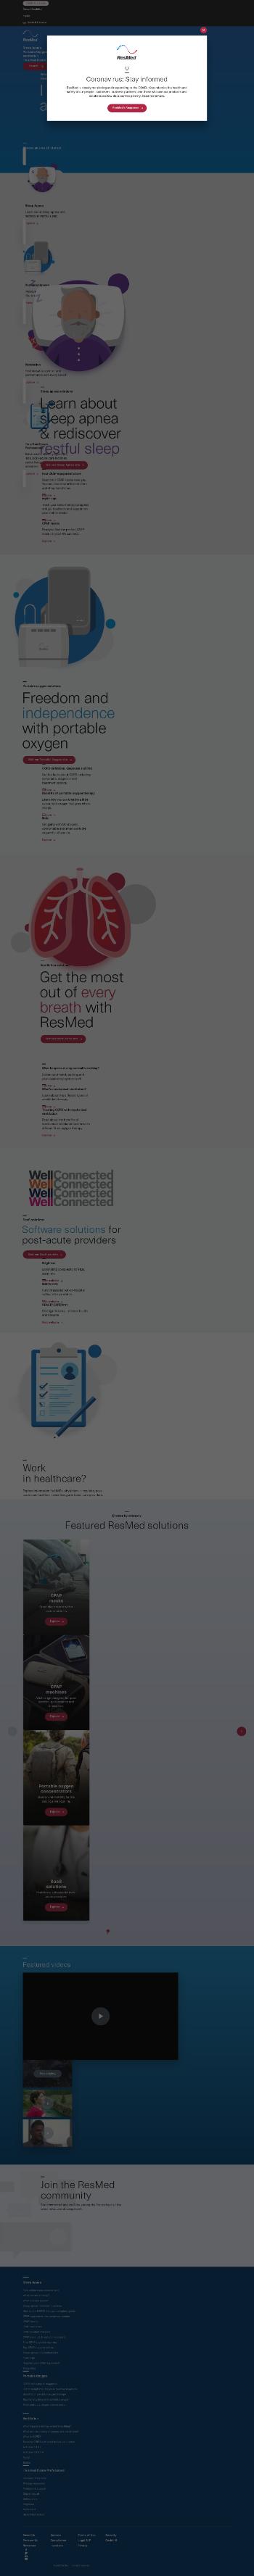 ResMed Inc. Website Screenshot